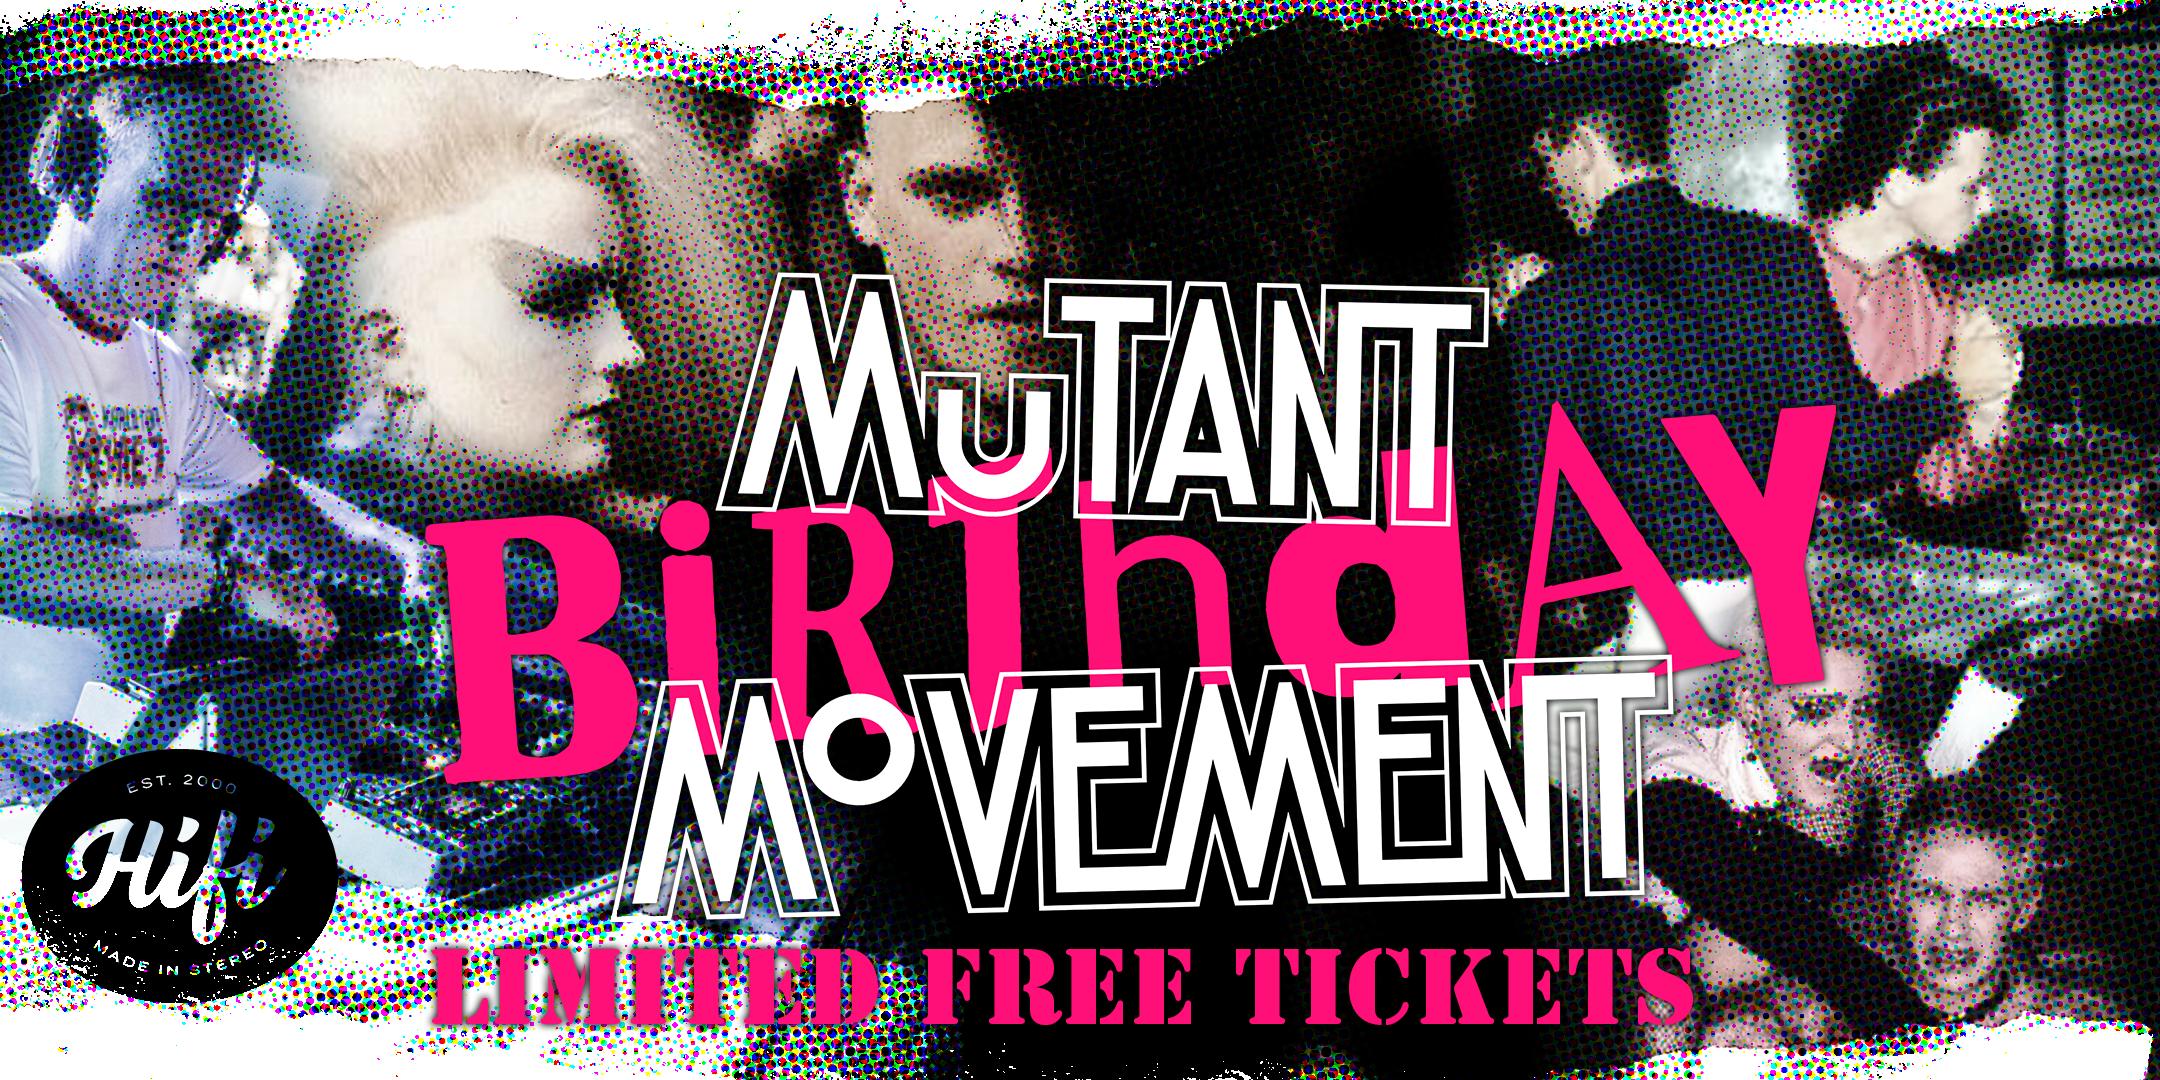 Mutant Movement Birthday*LIMITED FREE TICKETS*New Wave/Punk/Goth